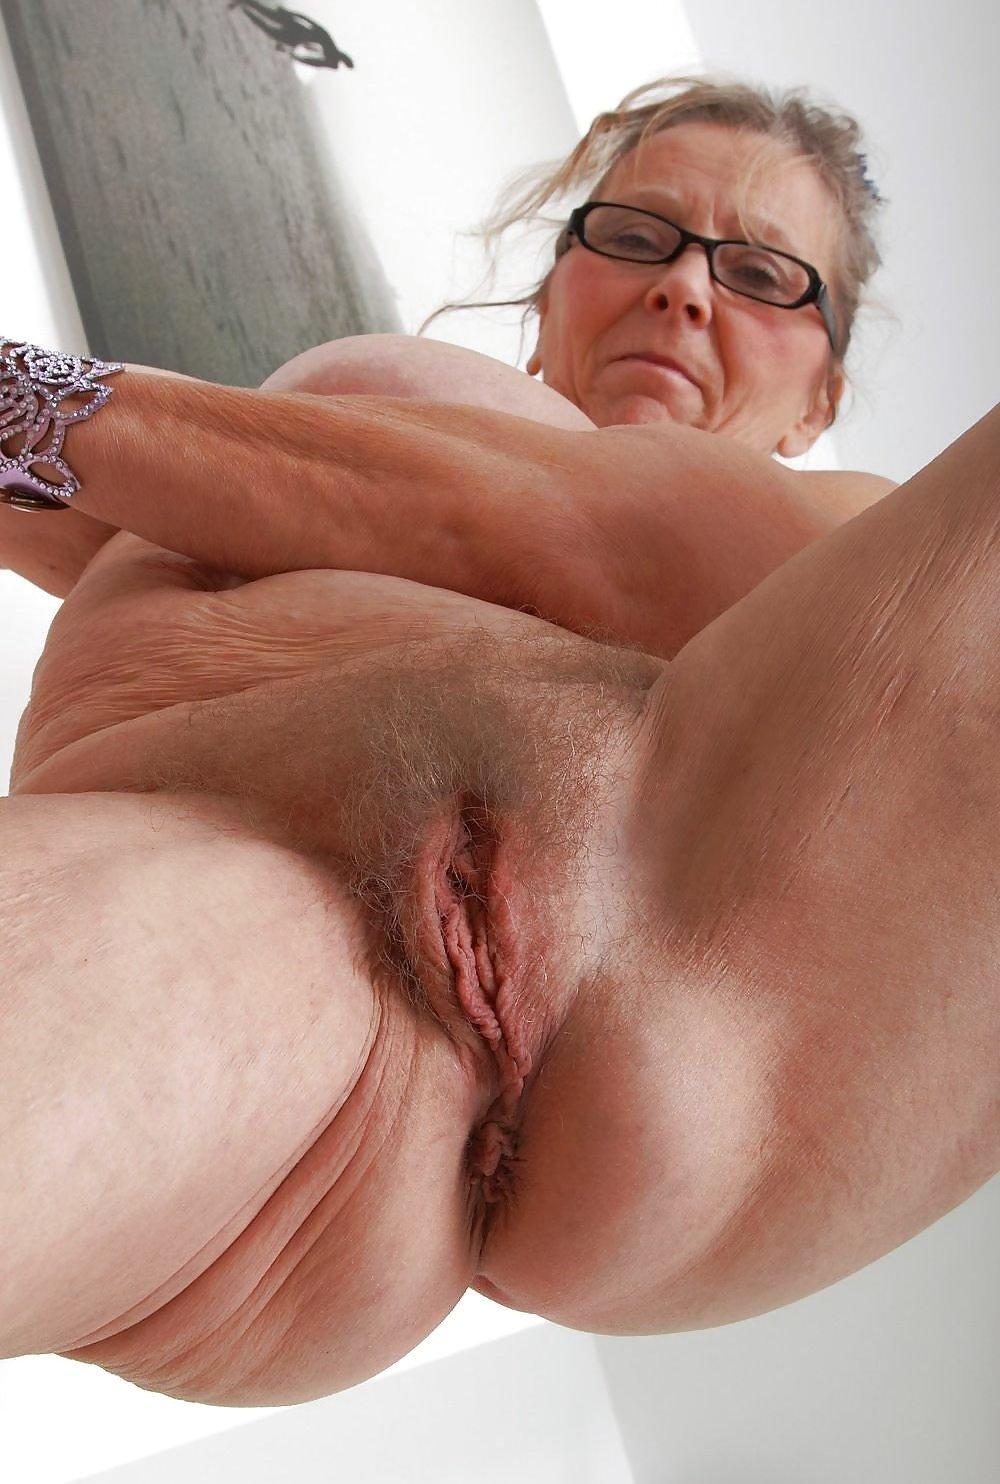 Hairy Granny Pussy Close Up